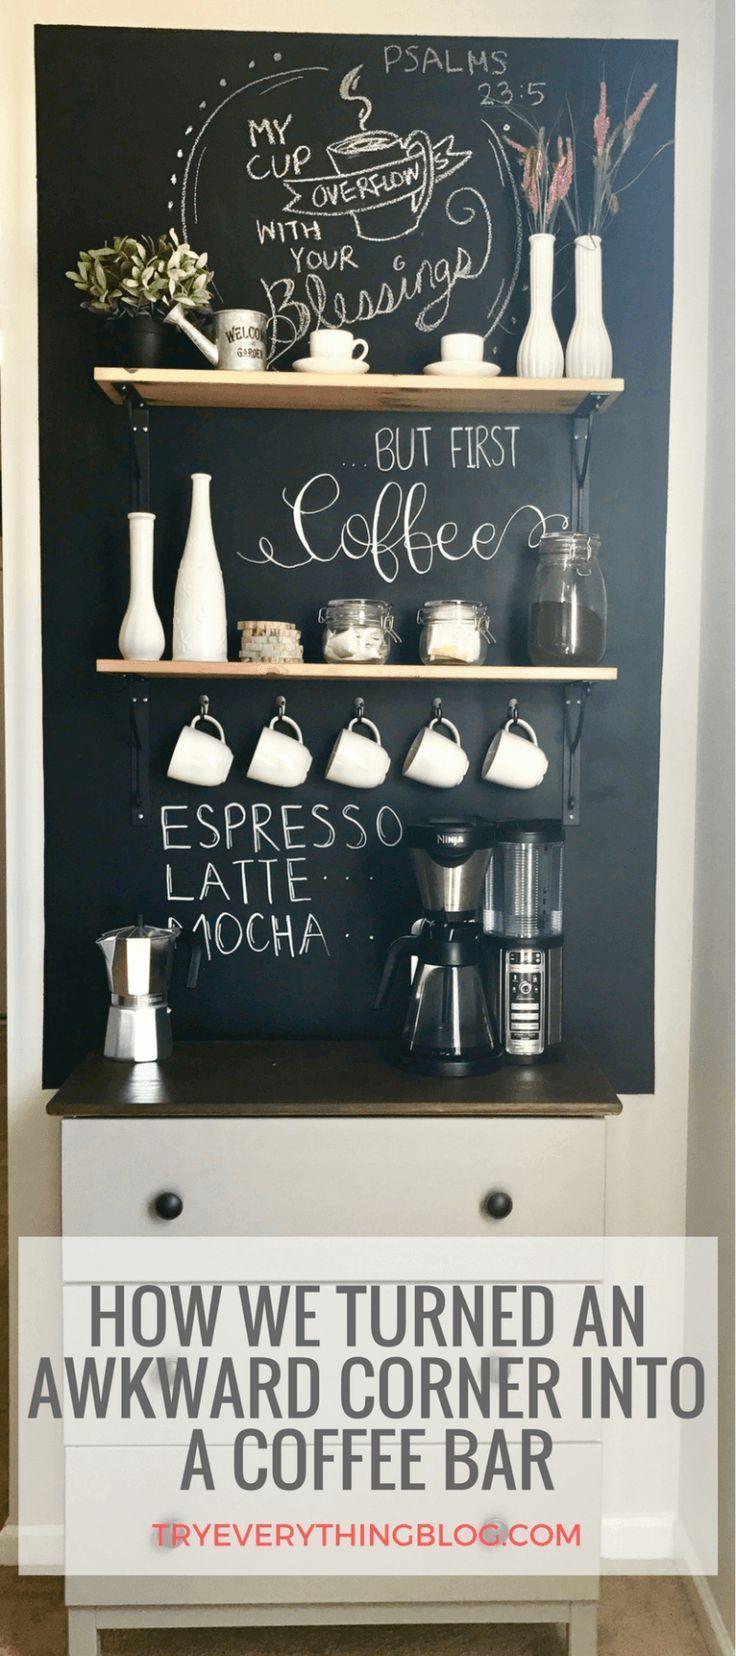 Transforming an awkward corner into the perfect Coffee Bar #coffeebarideas